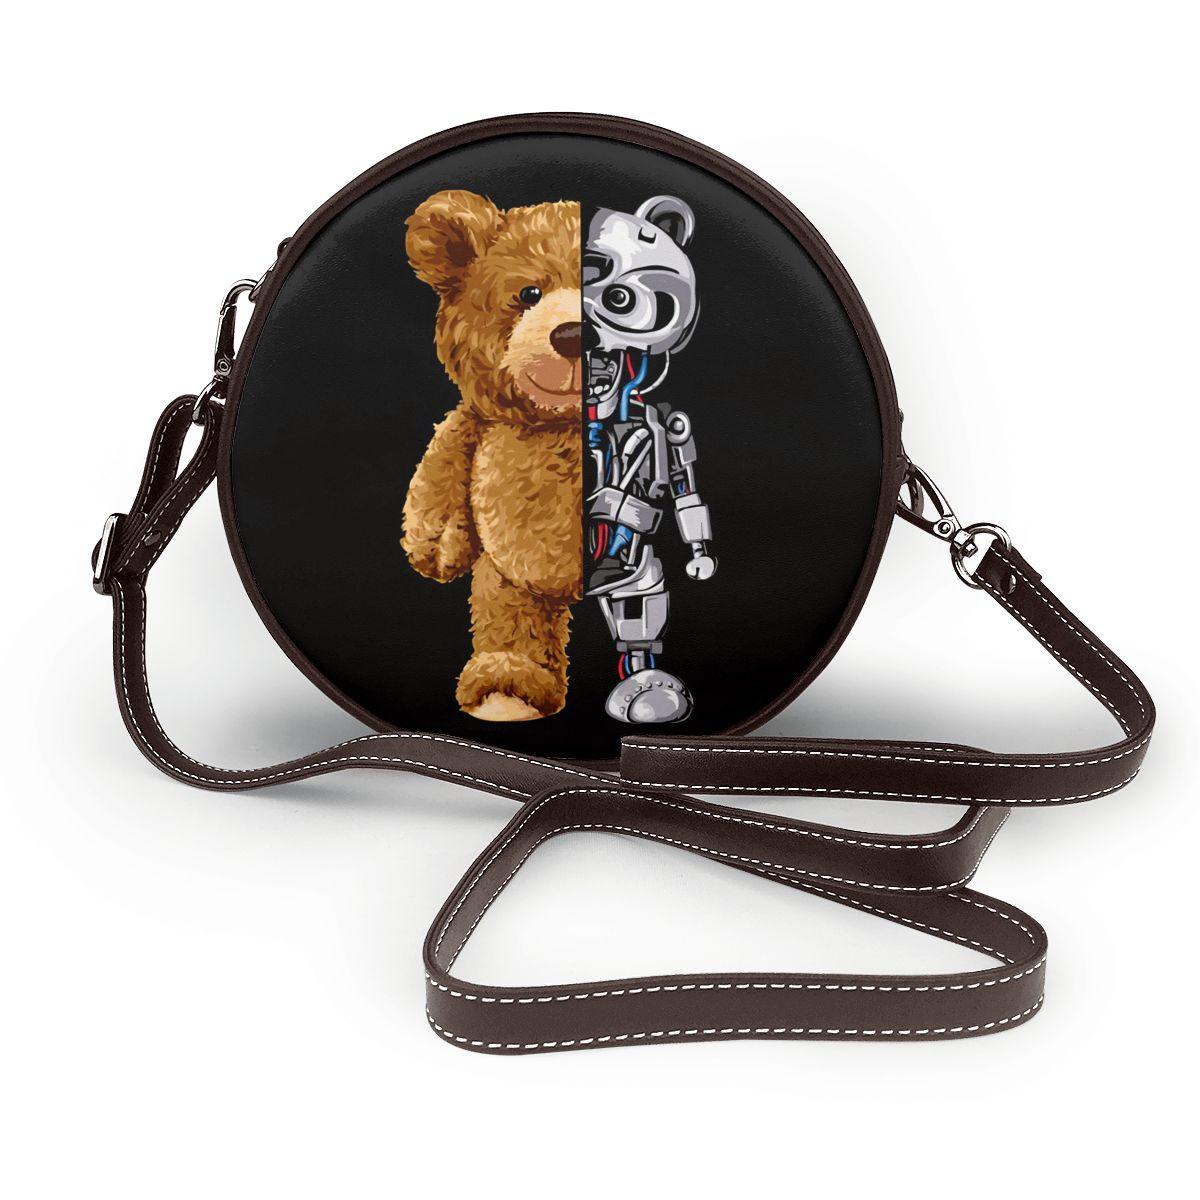 Fashion Cute Mini Round Crossbody Bags for Girls Luxury Designer Women Leather Shoulder Cross Body Bag Ladies Handbag Purse